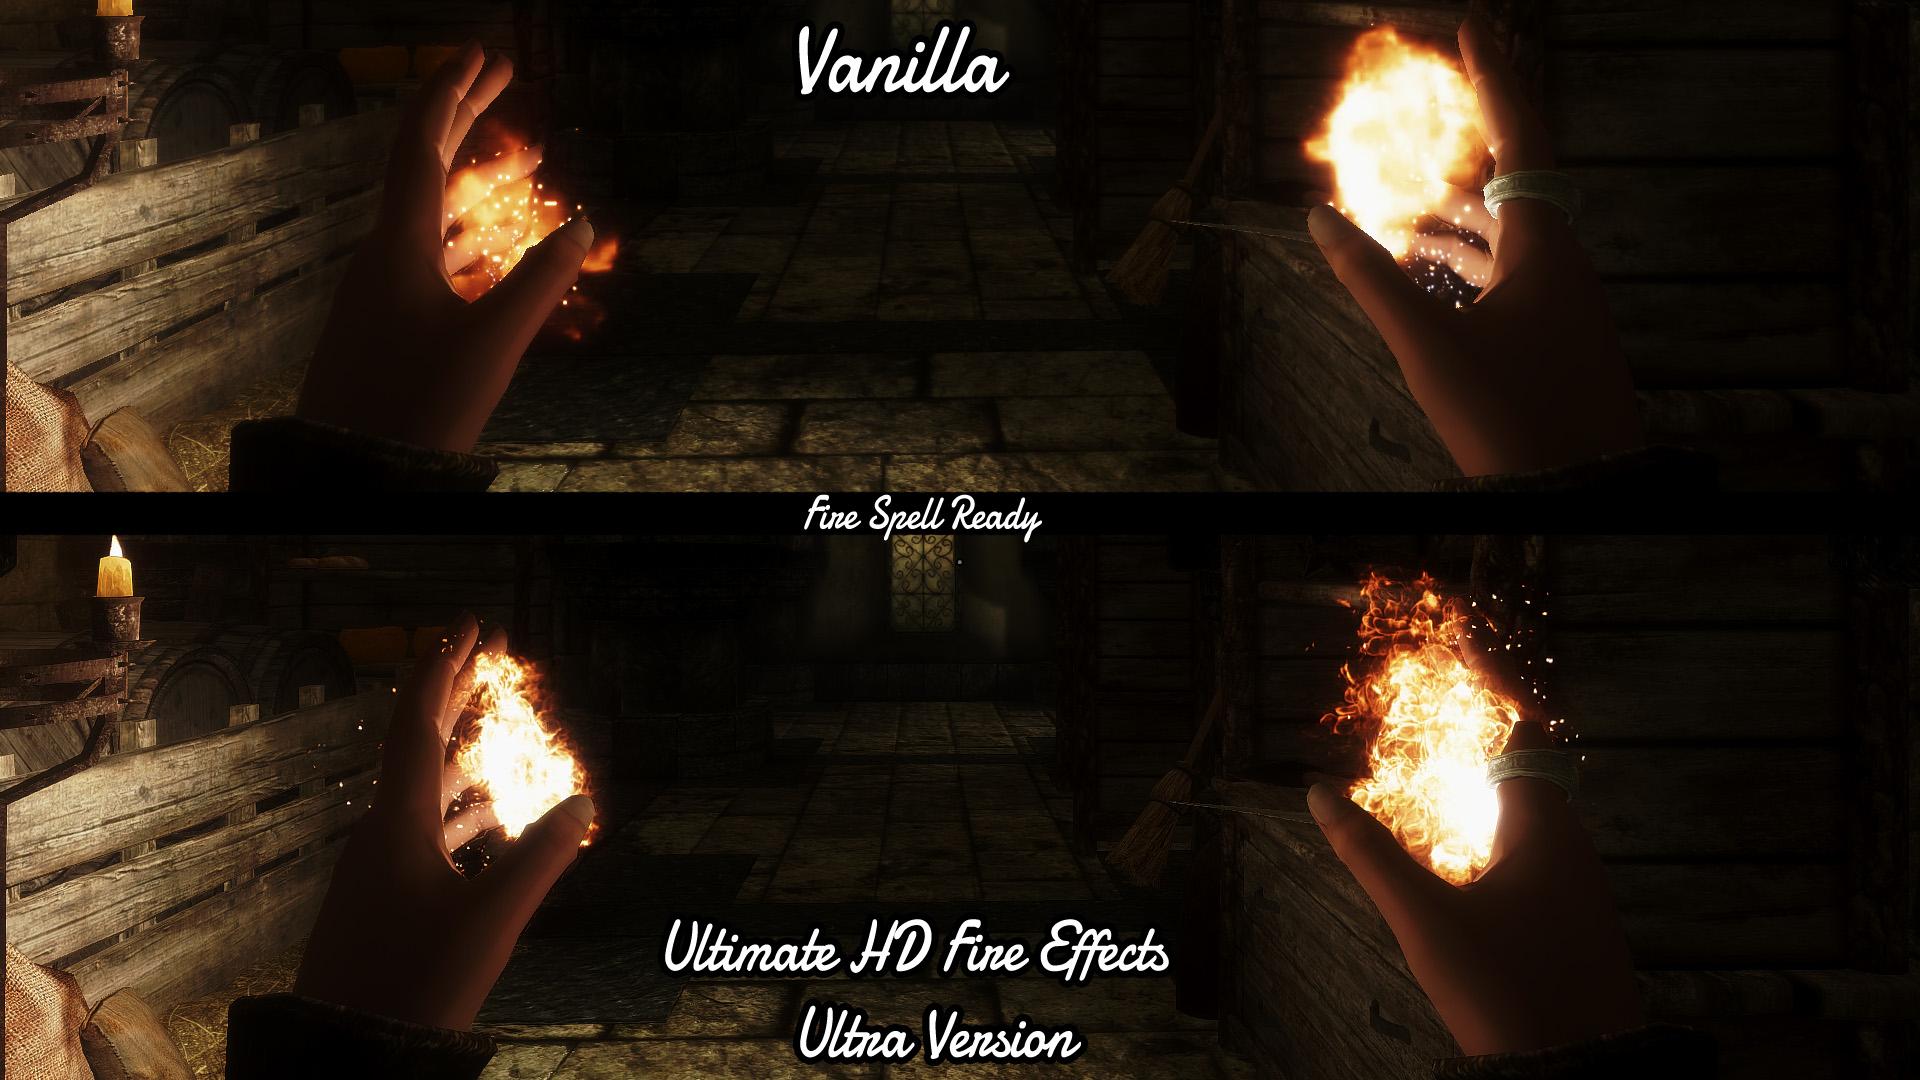 hd fire file - Enhanced Game Play 2 mod for Elder Scrolls V